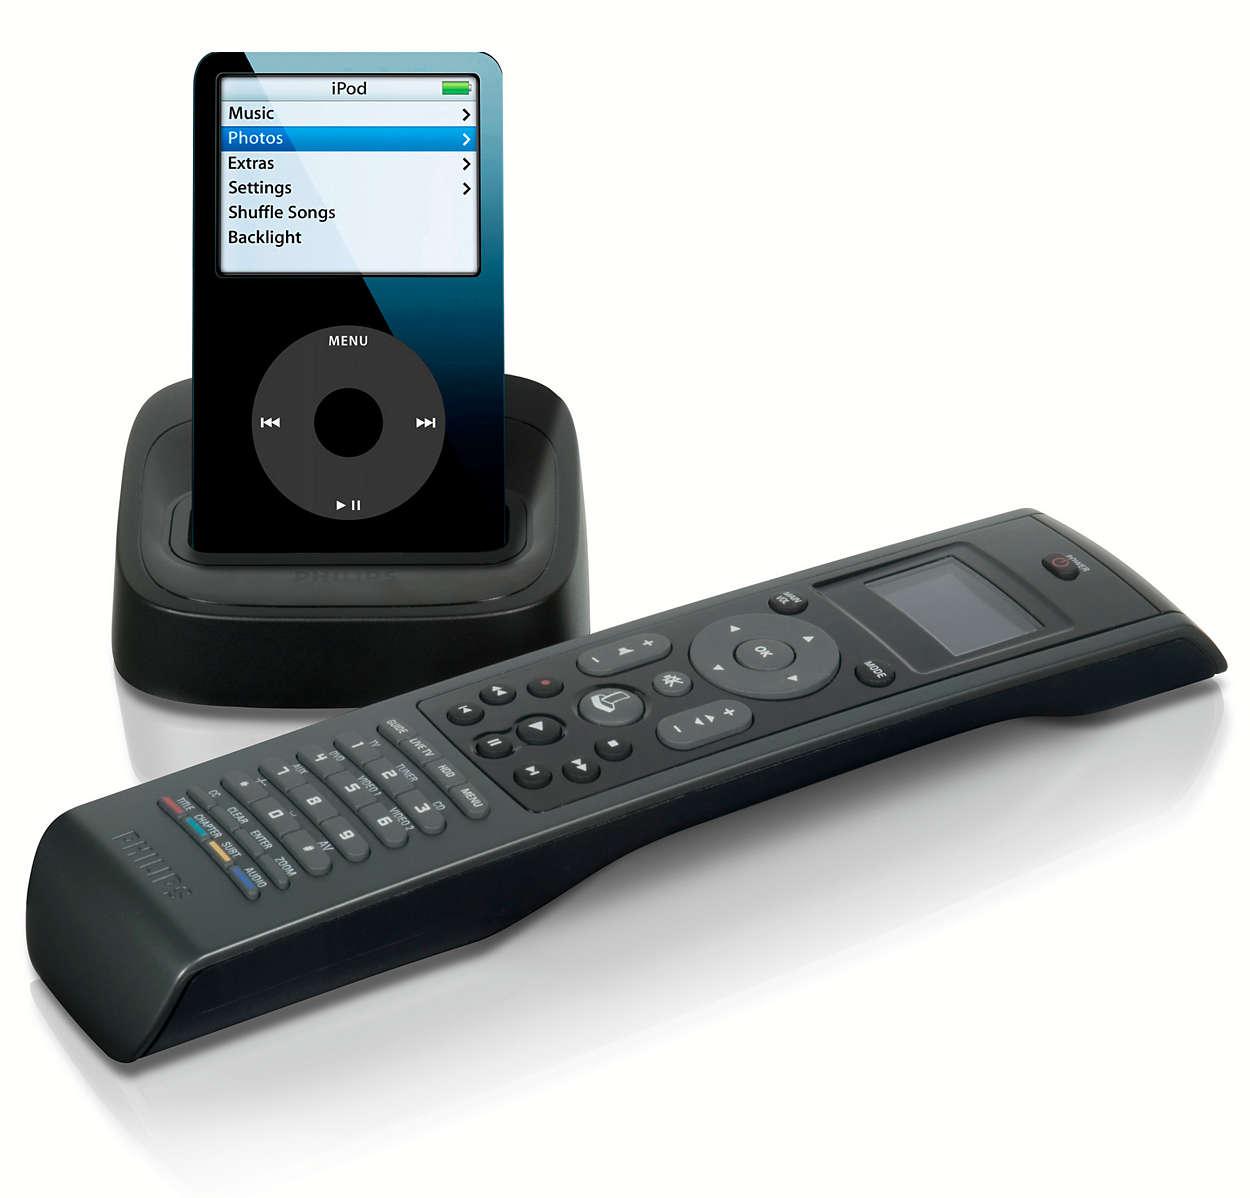 Få vist iPod på fjernbetjening